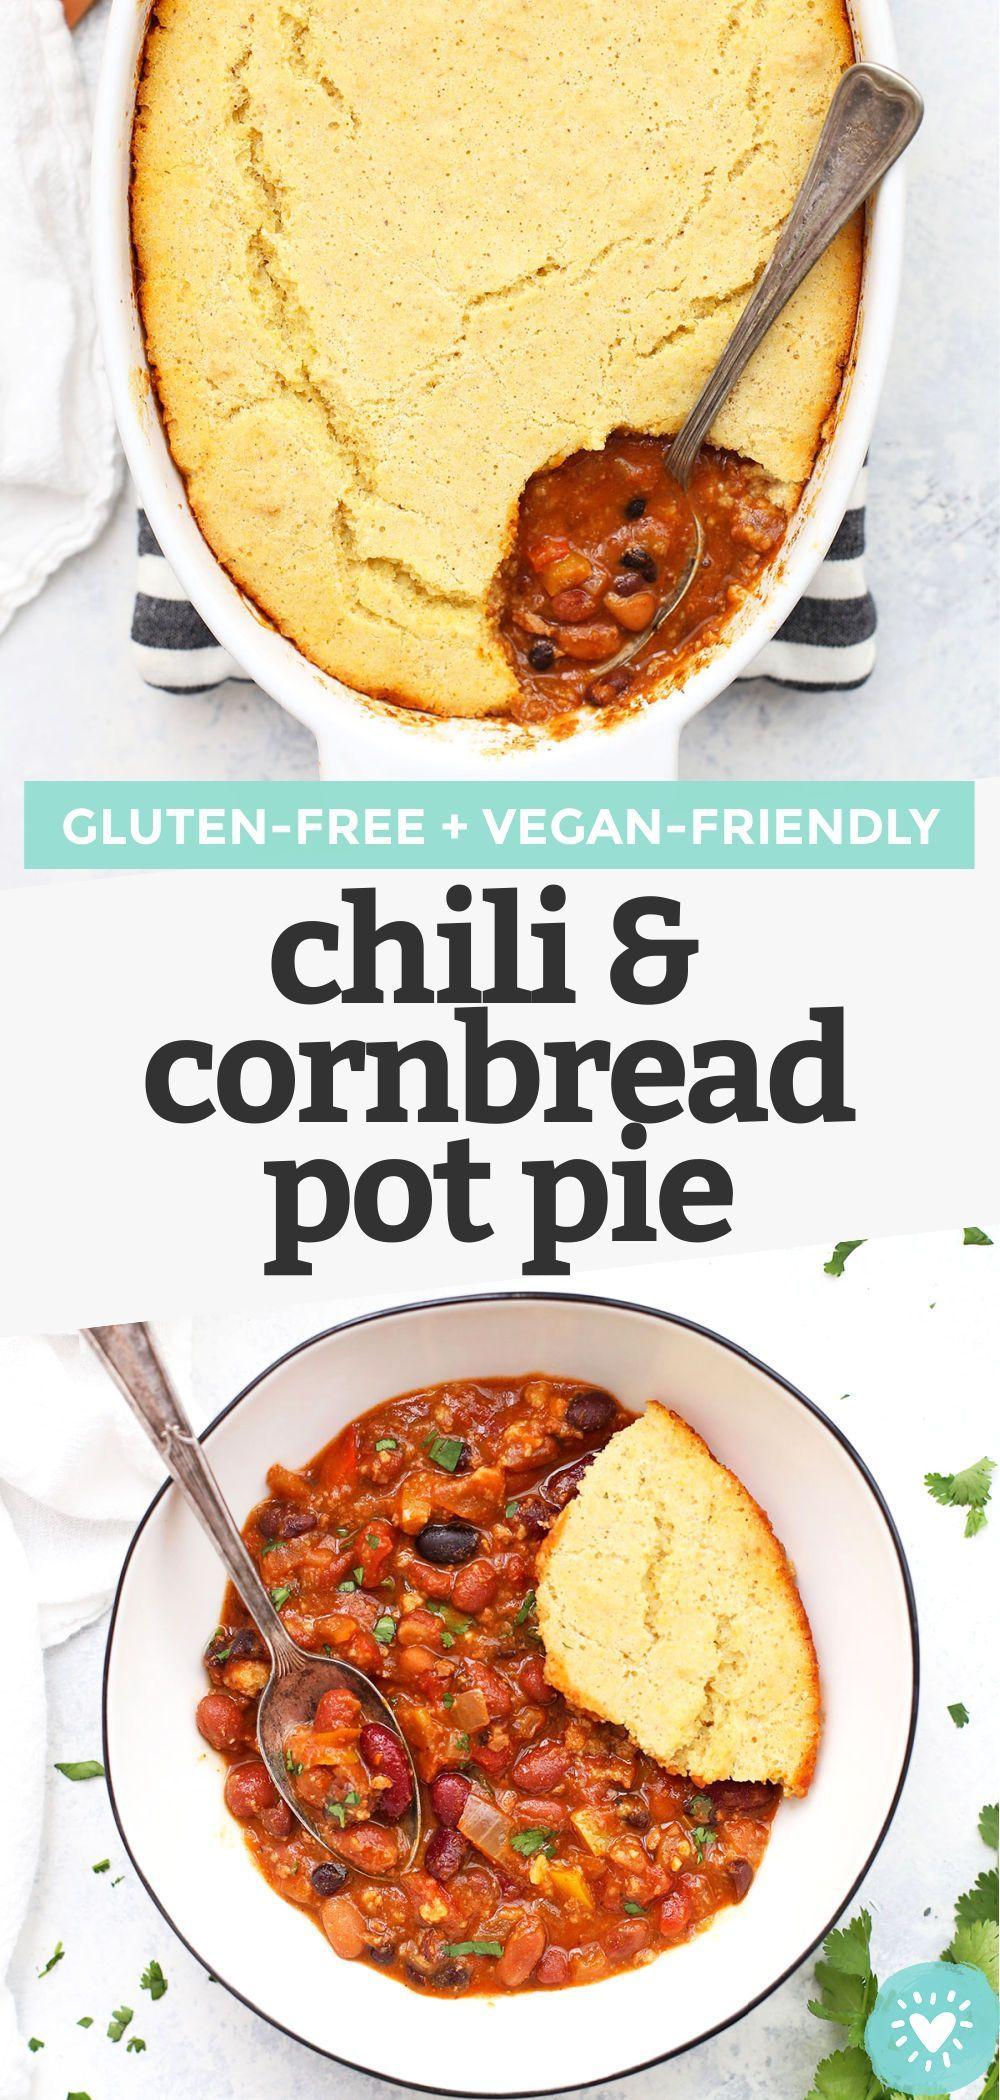 Chili Cornbread Pot Pie Gluten Free Vegan Friendly Recipe In 2020 Gluten Free Recipes For Dinner Pot Pies Recipes Chili And Cornbread